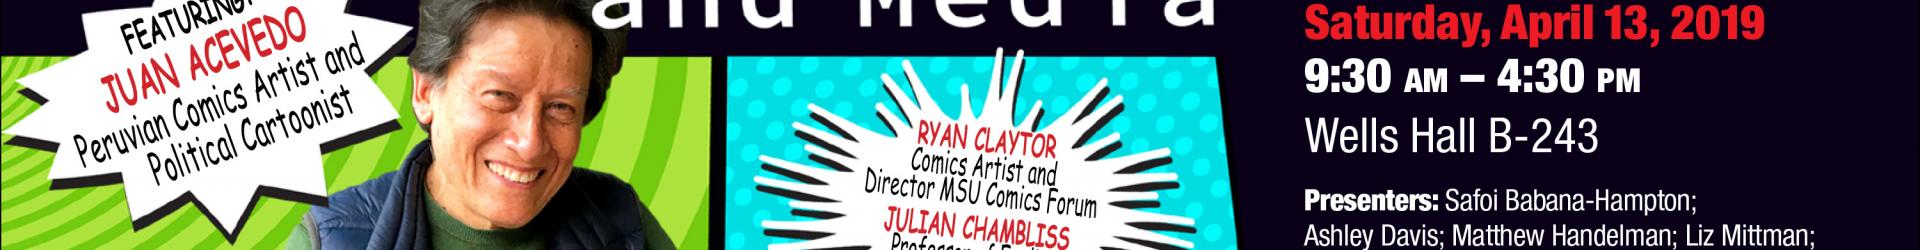 2019 GNN Symposium: Translation, Comics, and Media